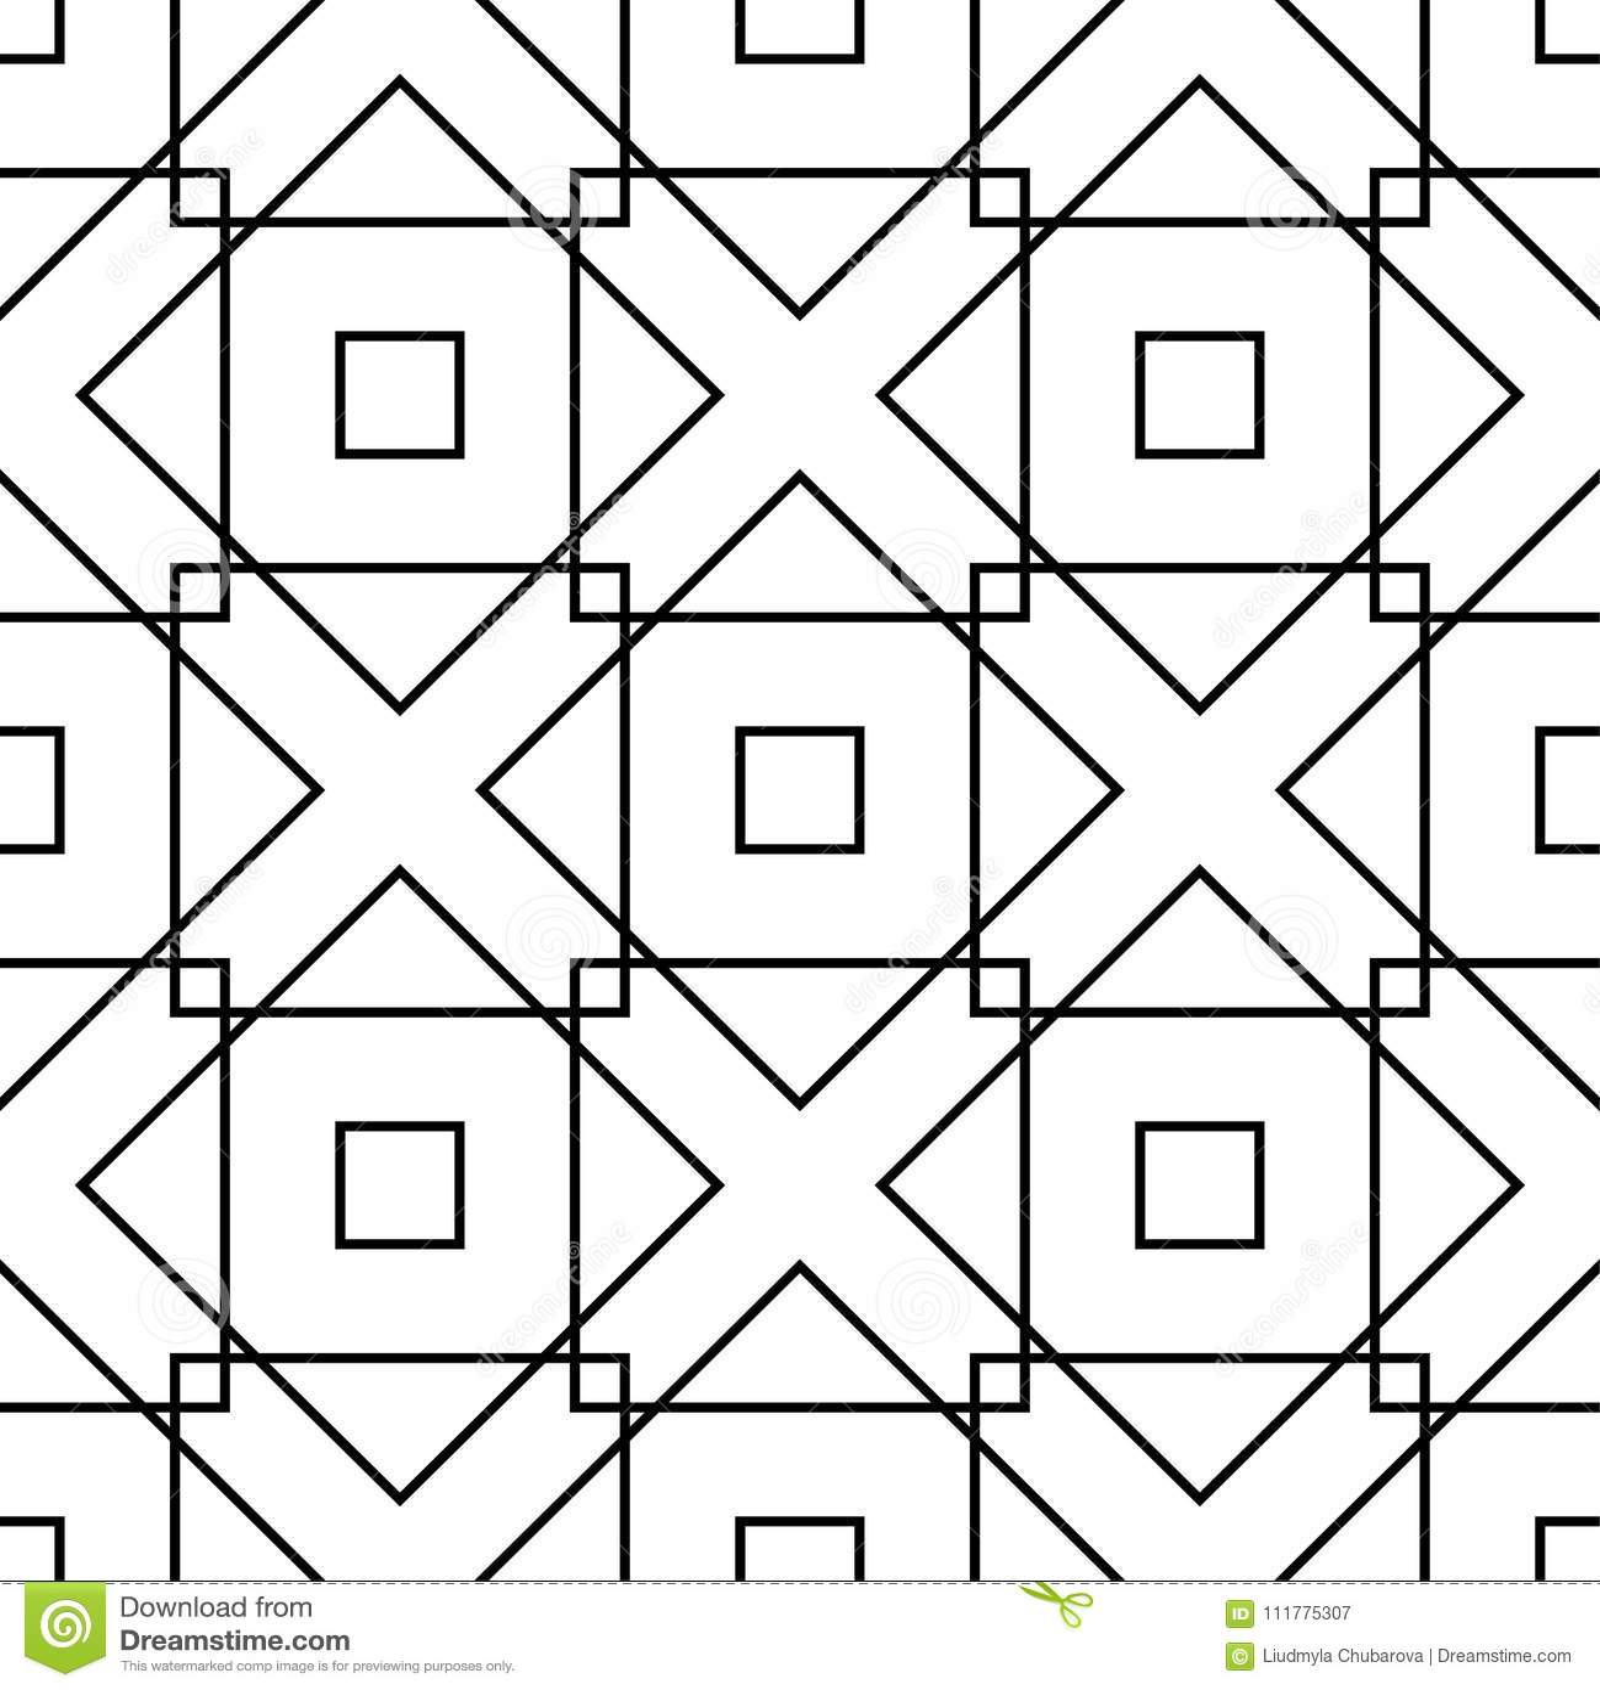 White and black monochrome geometric ornament. Seamless pattern